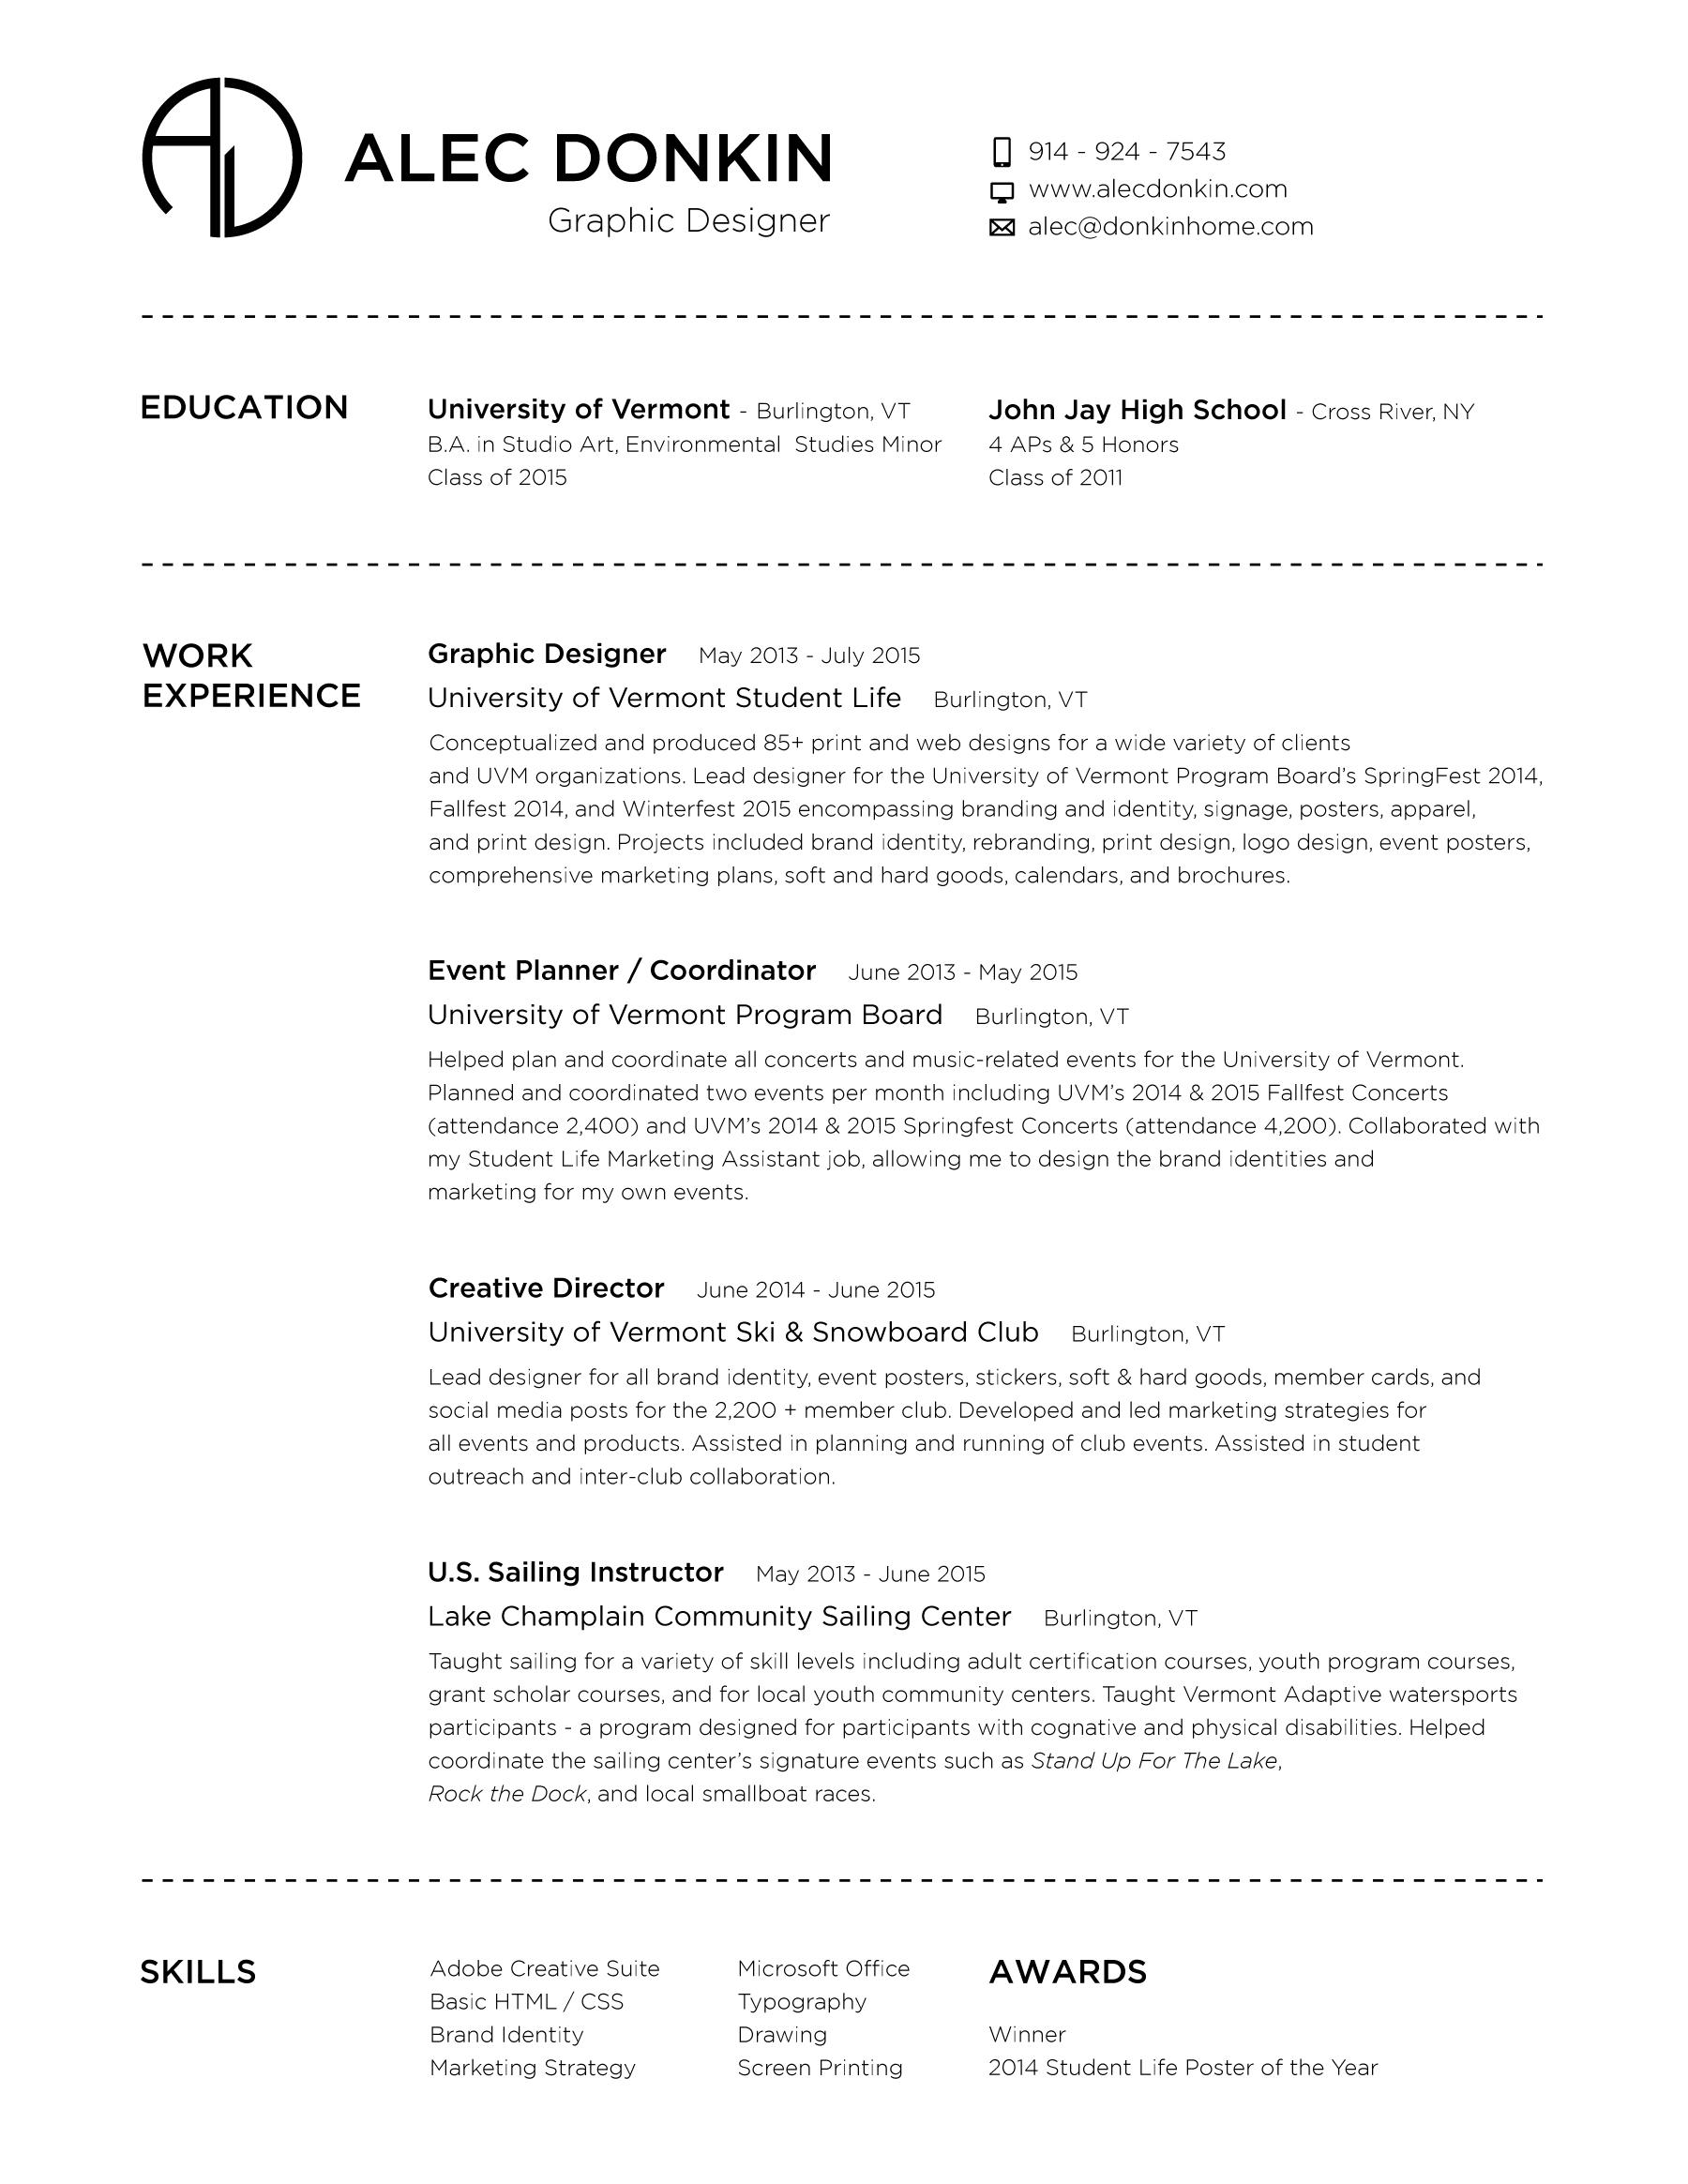 Adonkin_resume.jpg